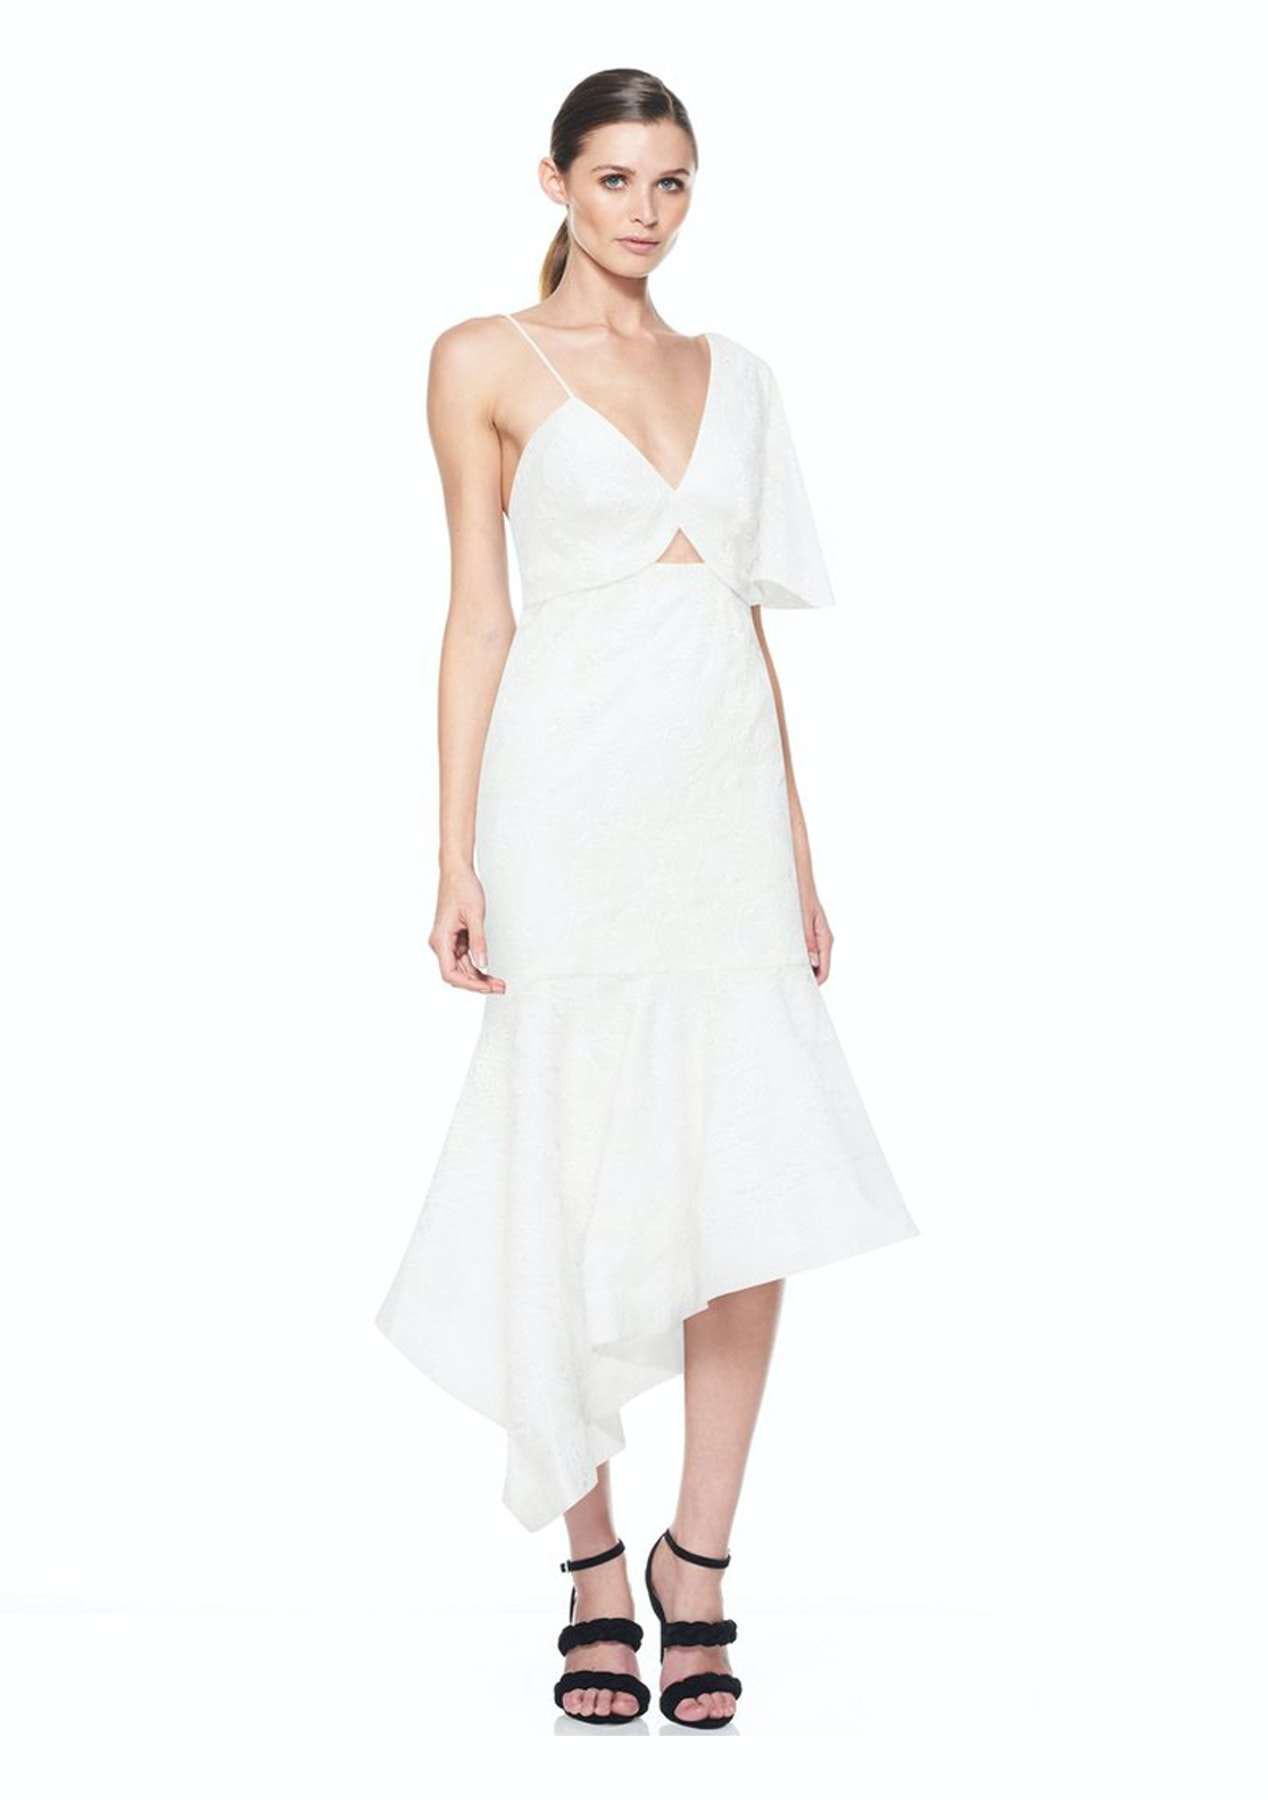 48b9701b3c96 La Maison Talulah - Untold Desire Midi Dress - White - New Stevie May, Isla  & La Maison Talulah - Onceit